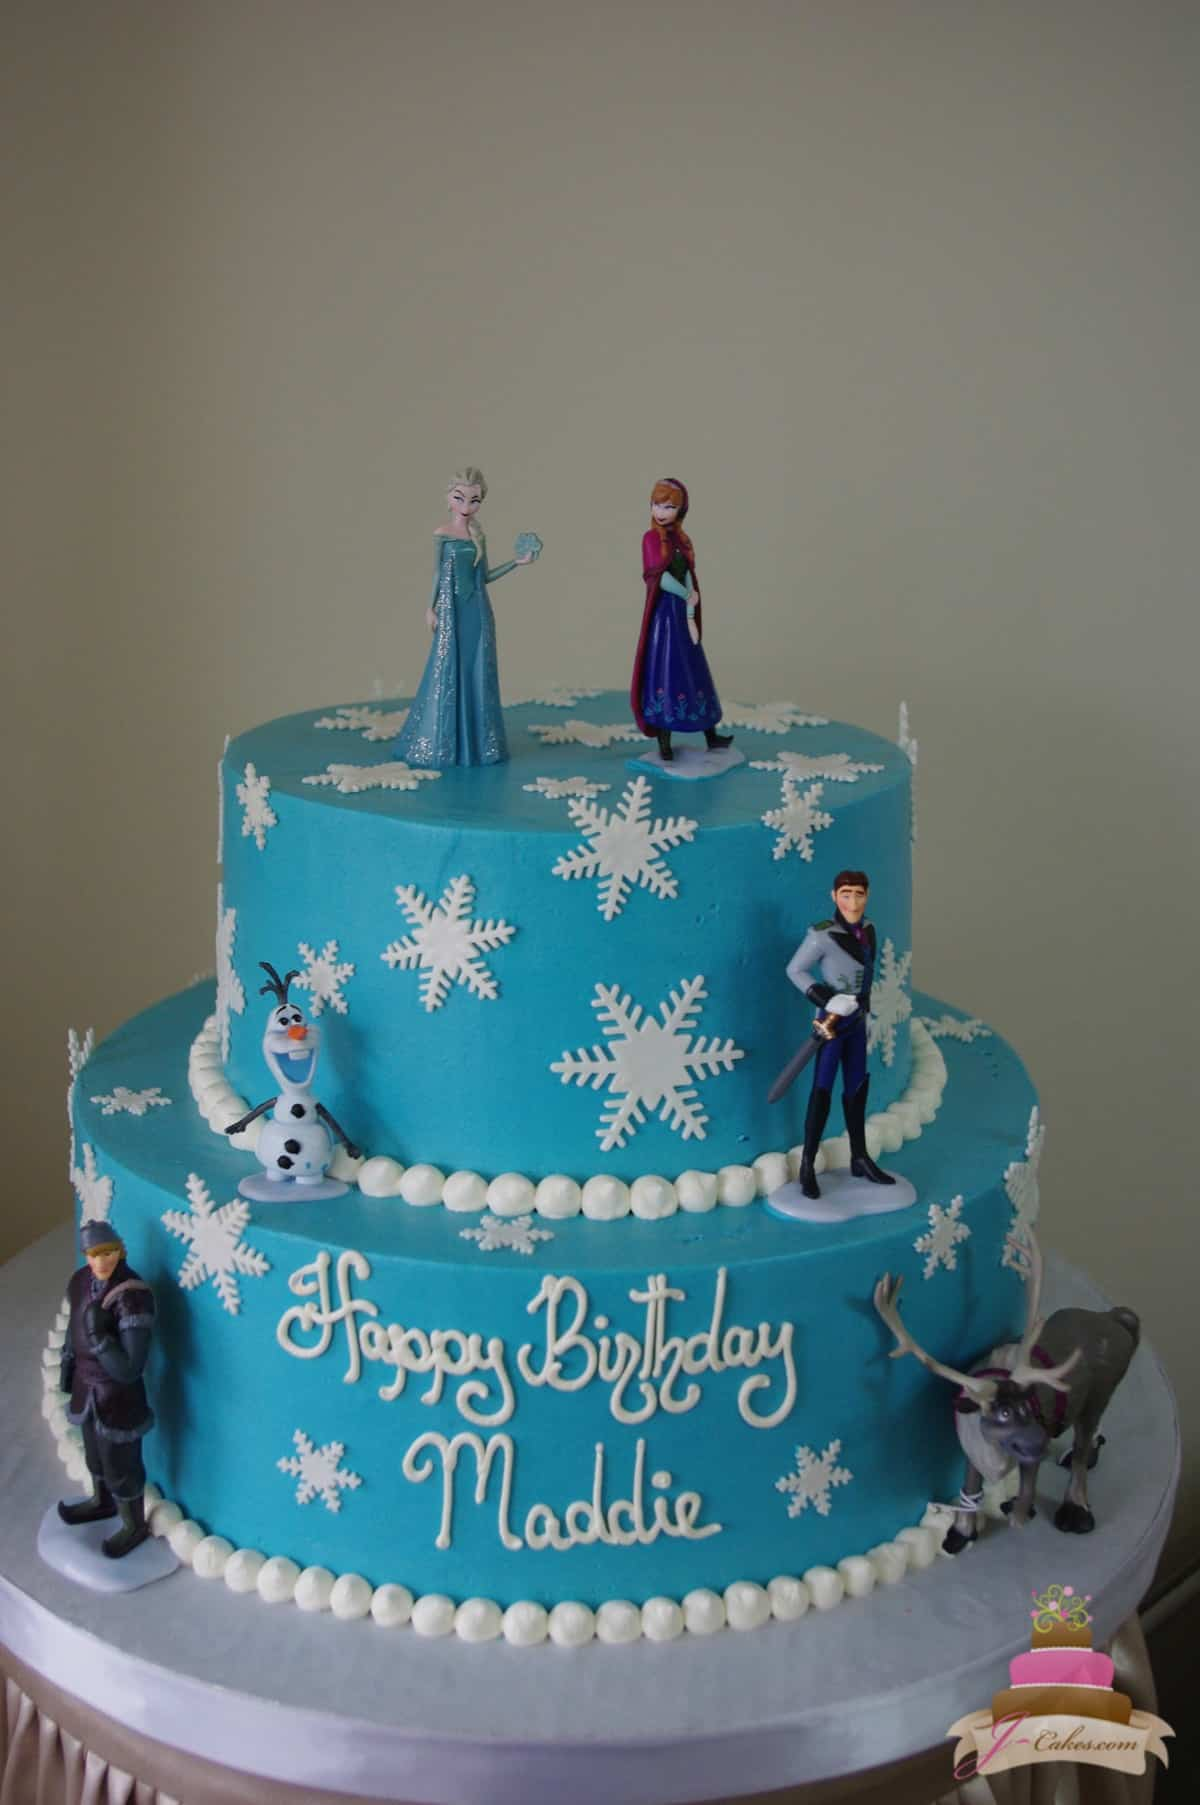 Enchanting Children's Cakes in CT